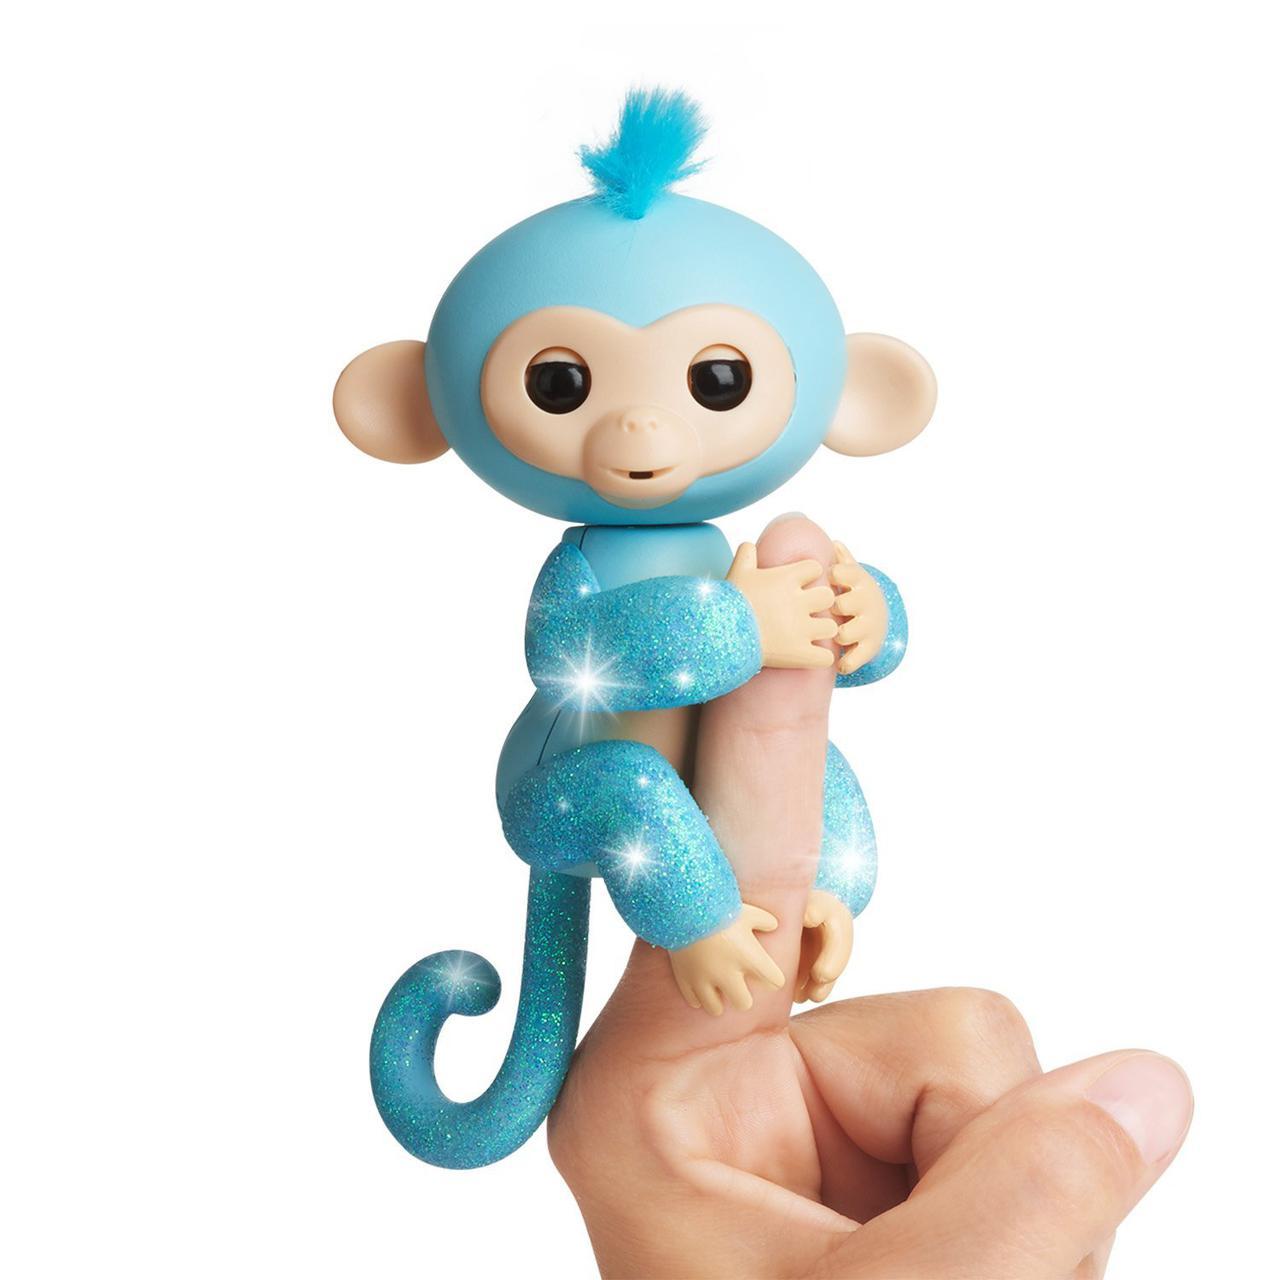 Блестящая обезьянка интерактивная на пальчик, WowWee Fingerlings Glitter Monkey  Оригинал из США